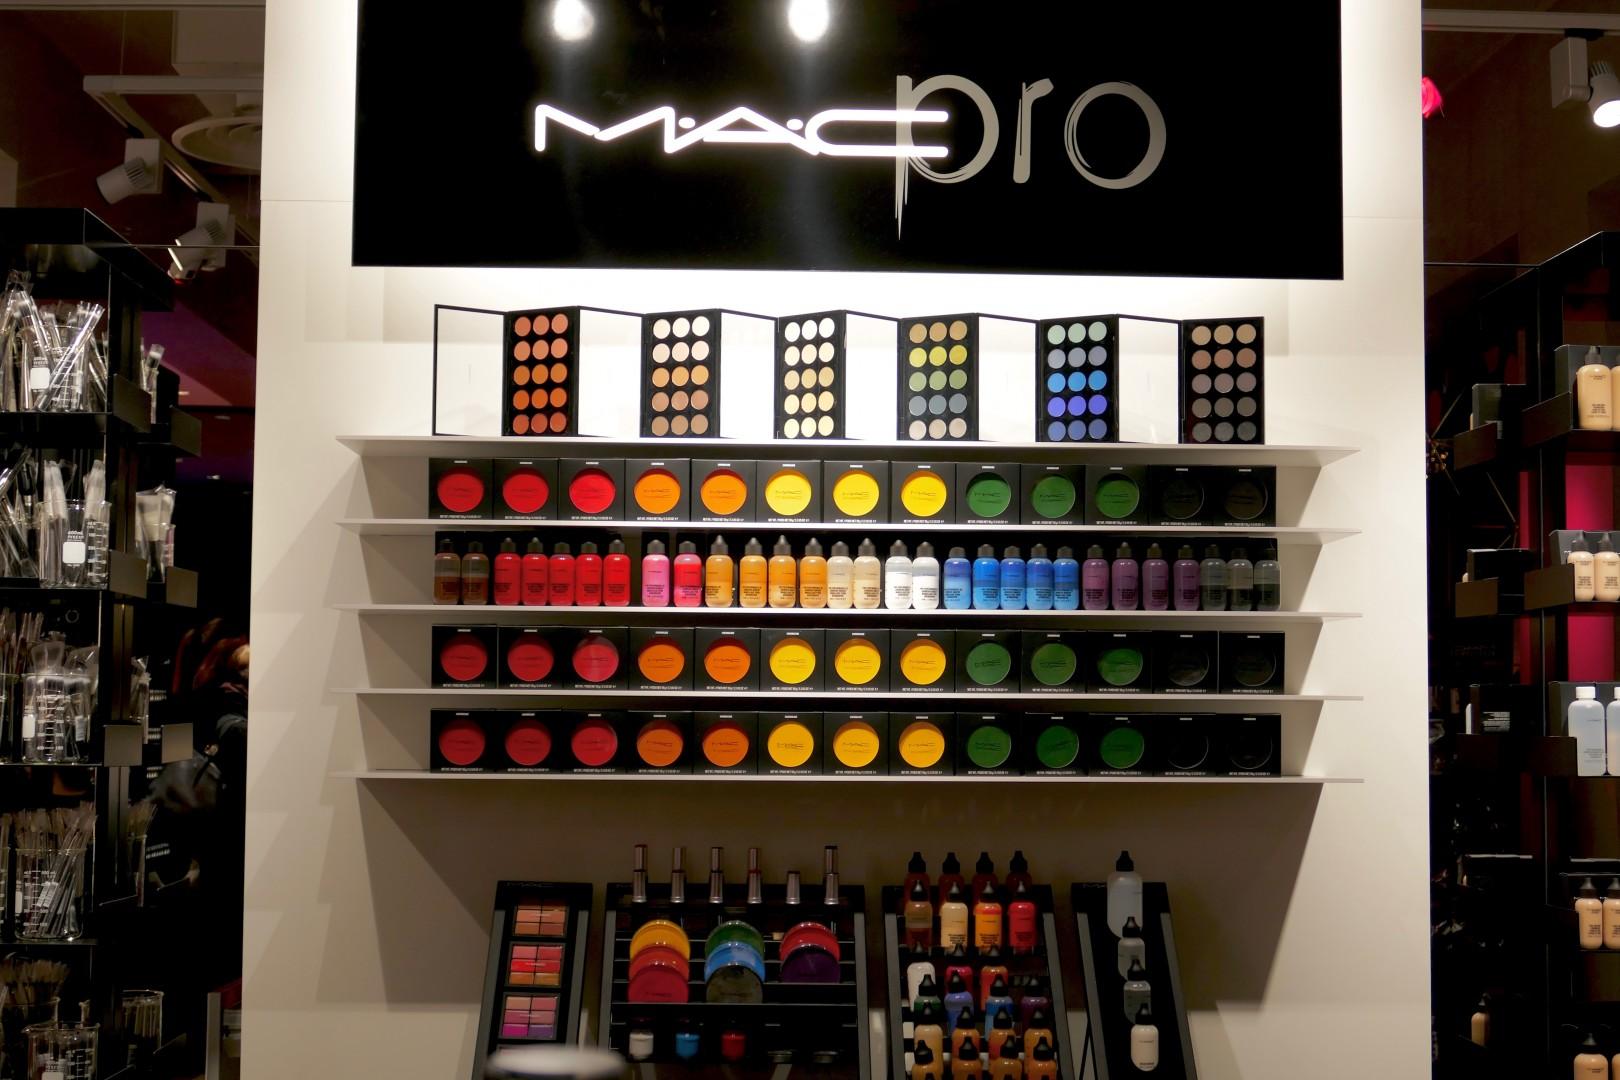 Mac Pro Store i Stockholm